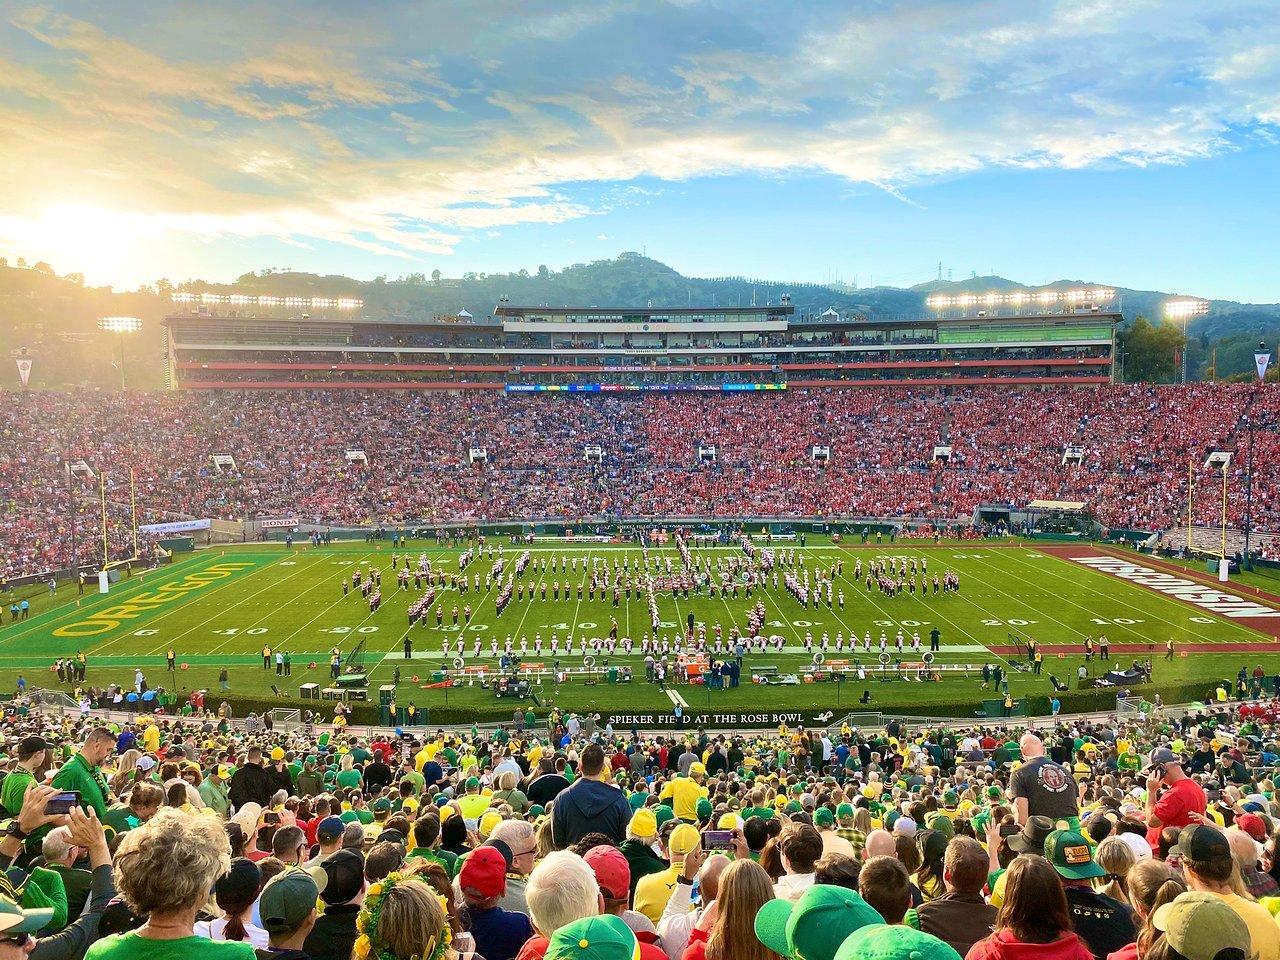 Rose Bowl Stadium Pasadena 2020 All You Need To Know Before You Go With Photos Tripadvisor